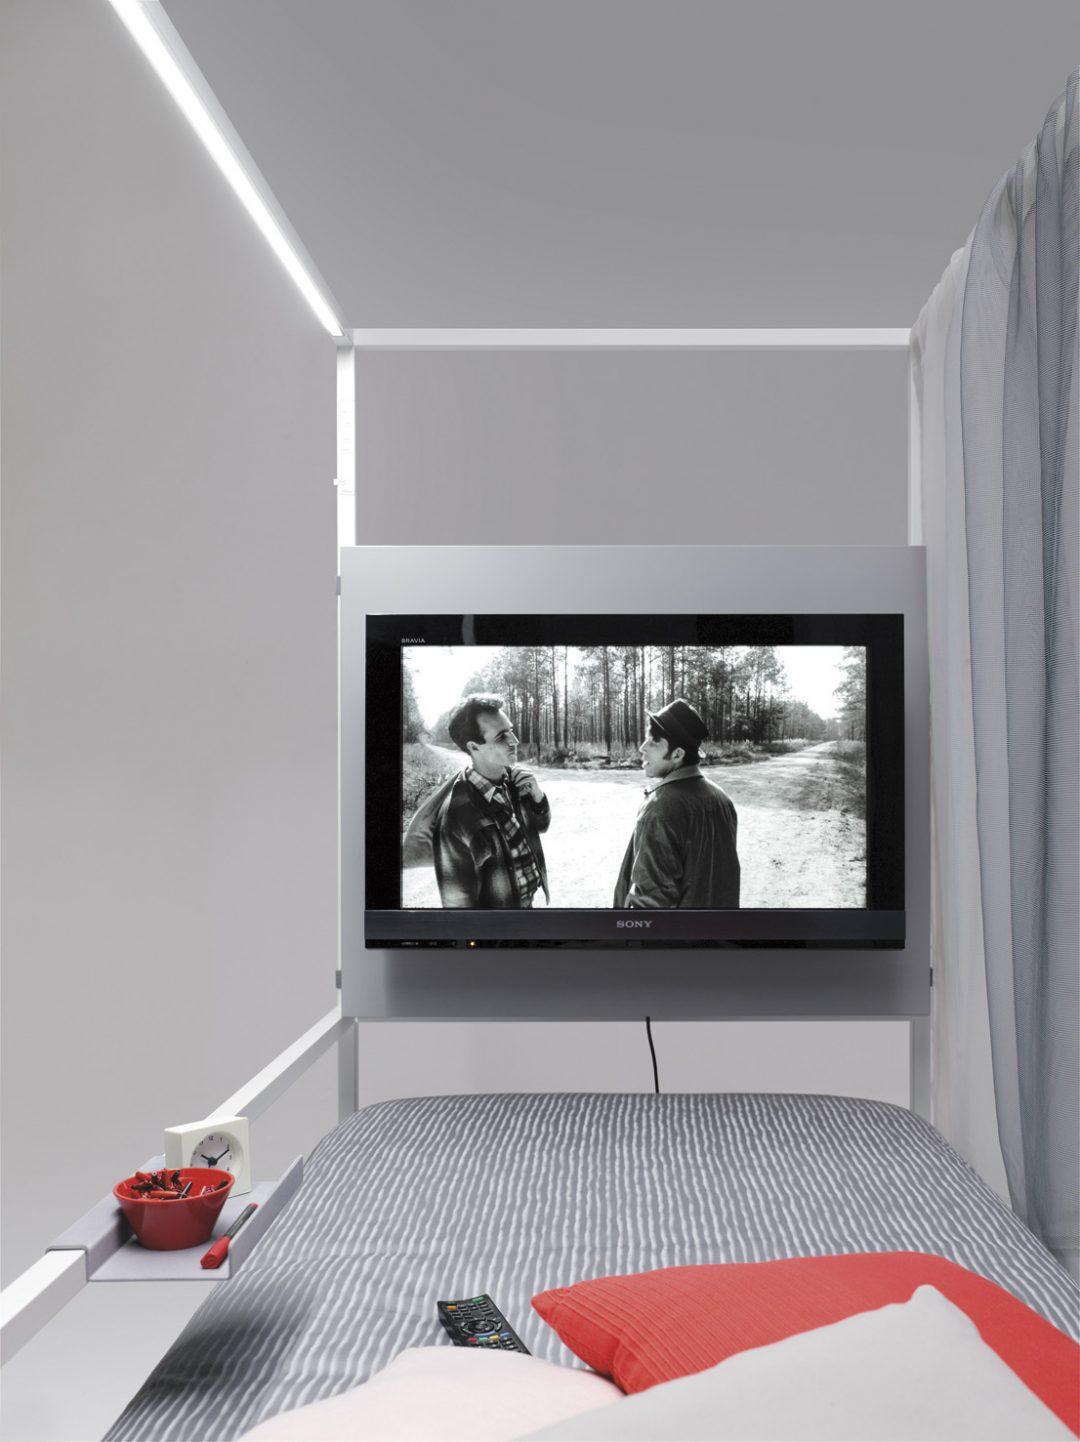 Detalle módulo tv en cama